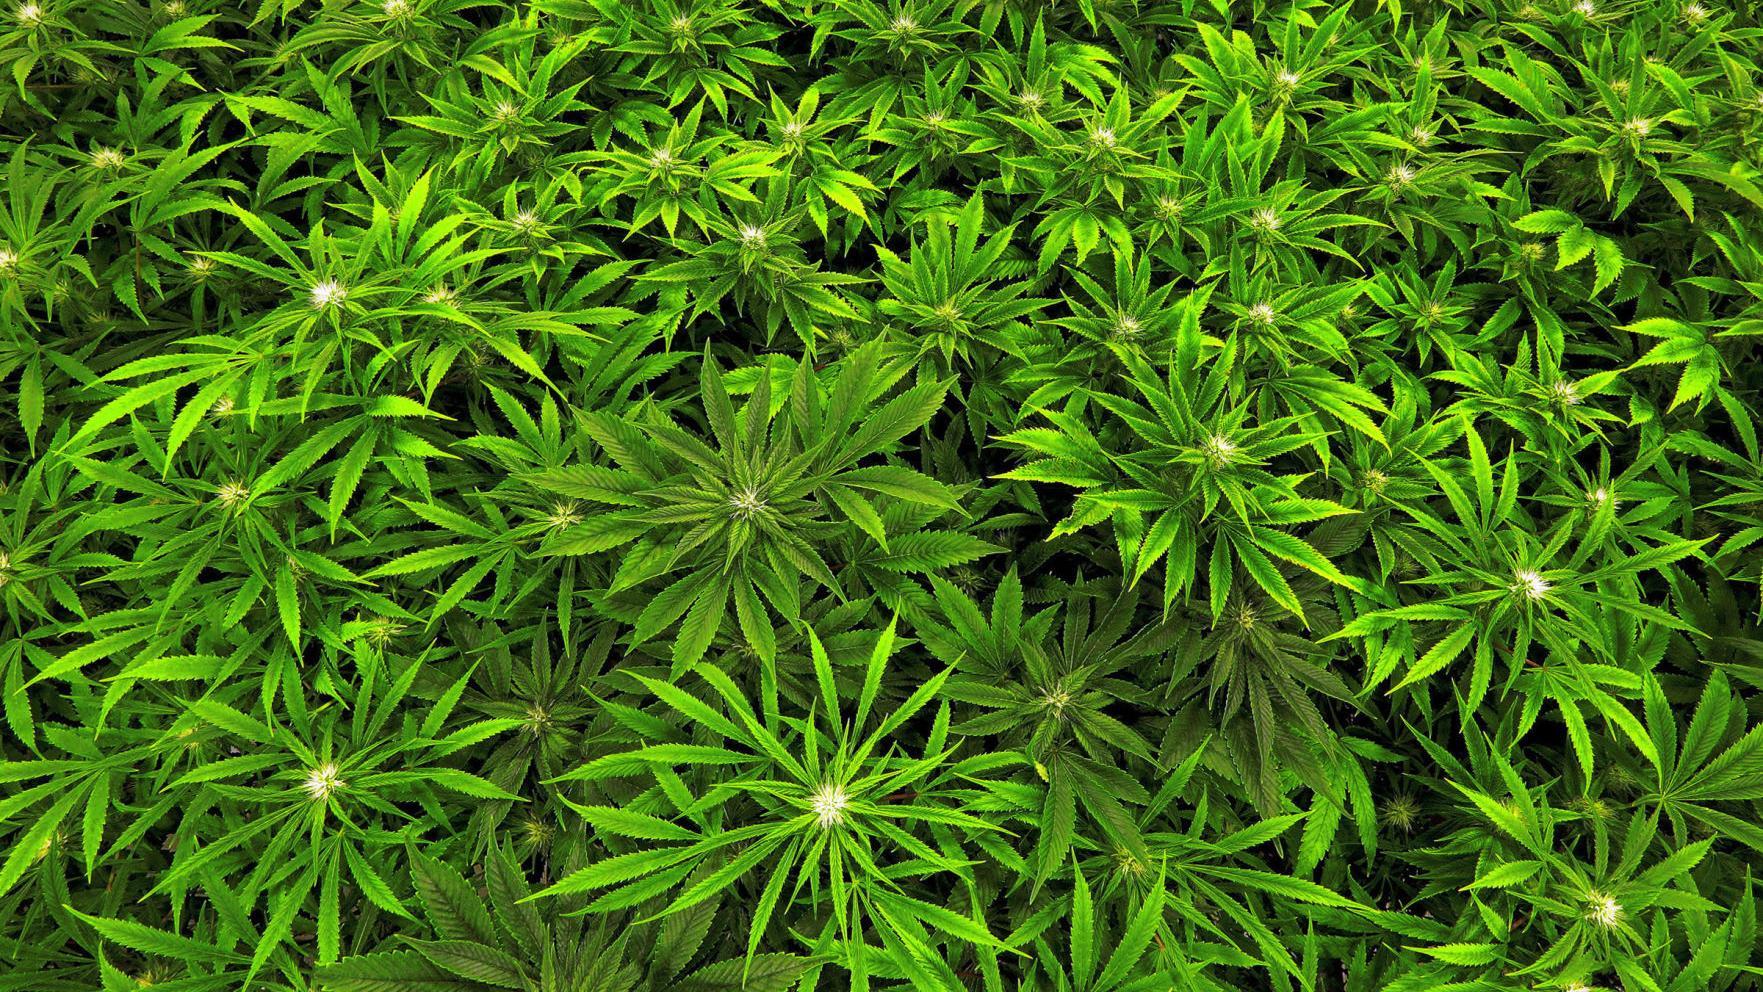 Health insurers won't cover medical marijuana in North Dakota